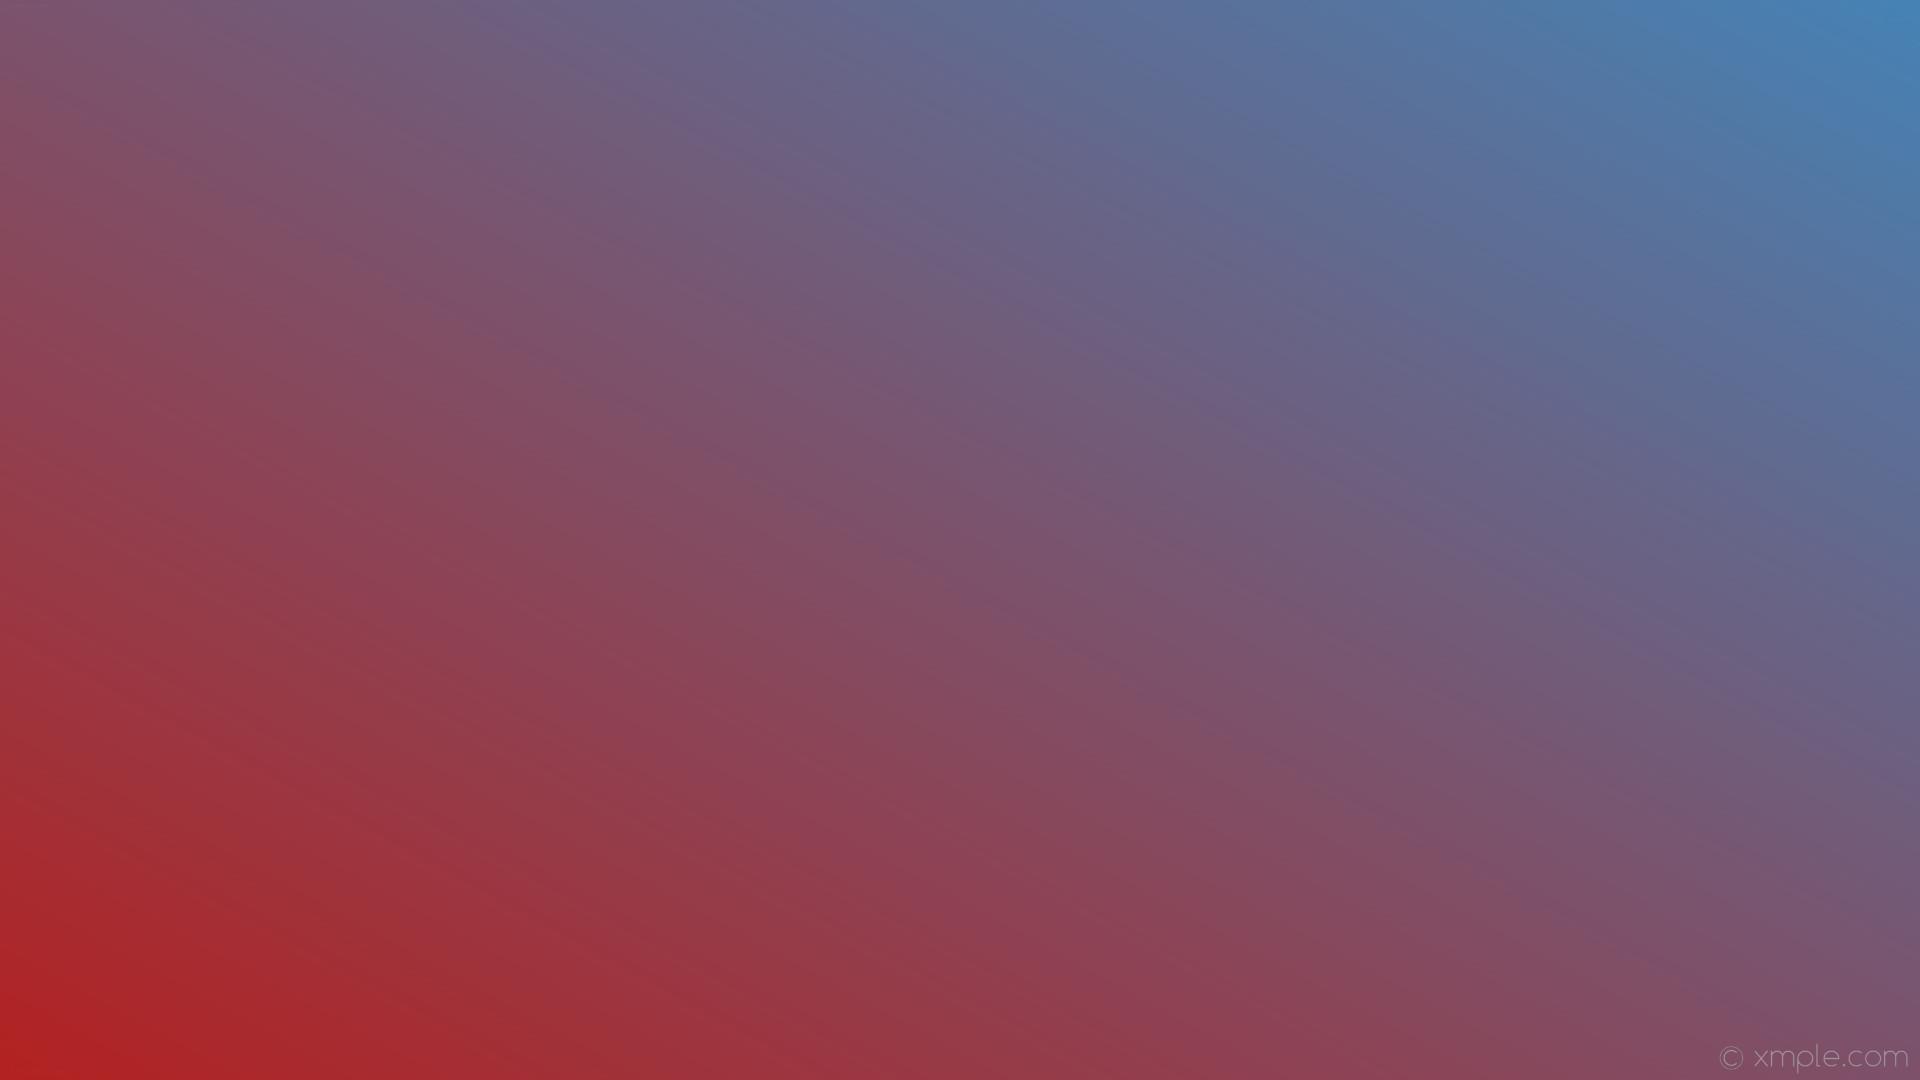 wallpaper gradient linear blue red steel blue fire brick #4682b4 #b22222 30°